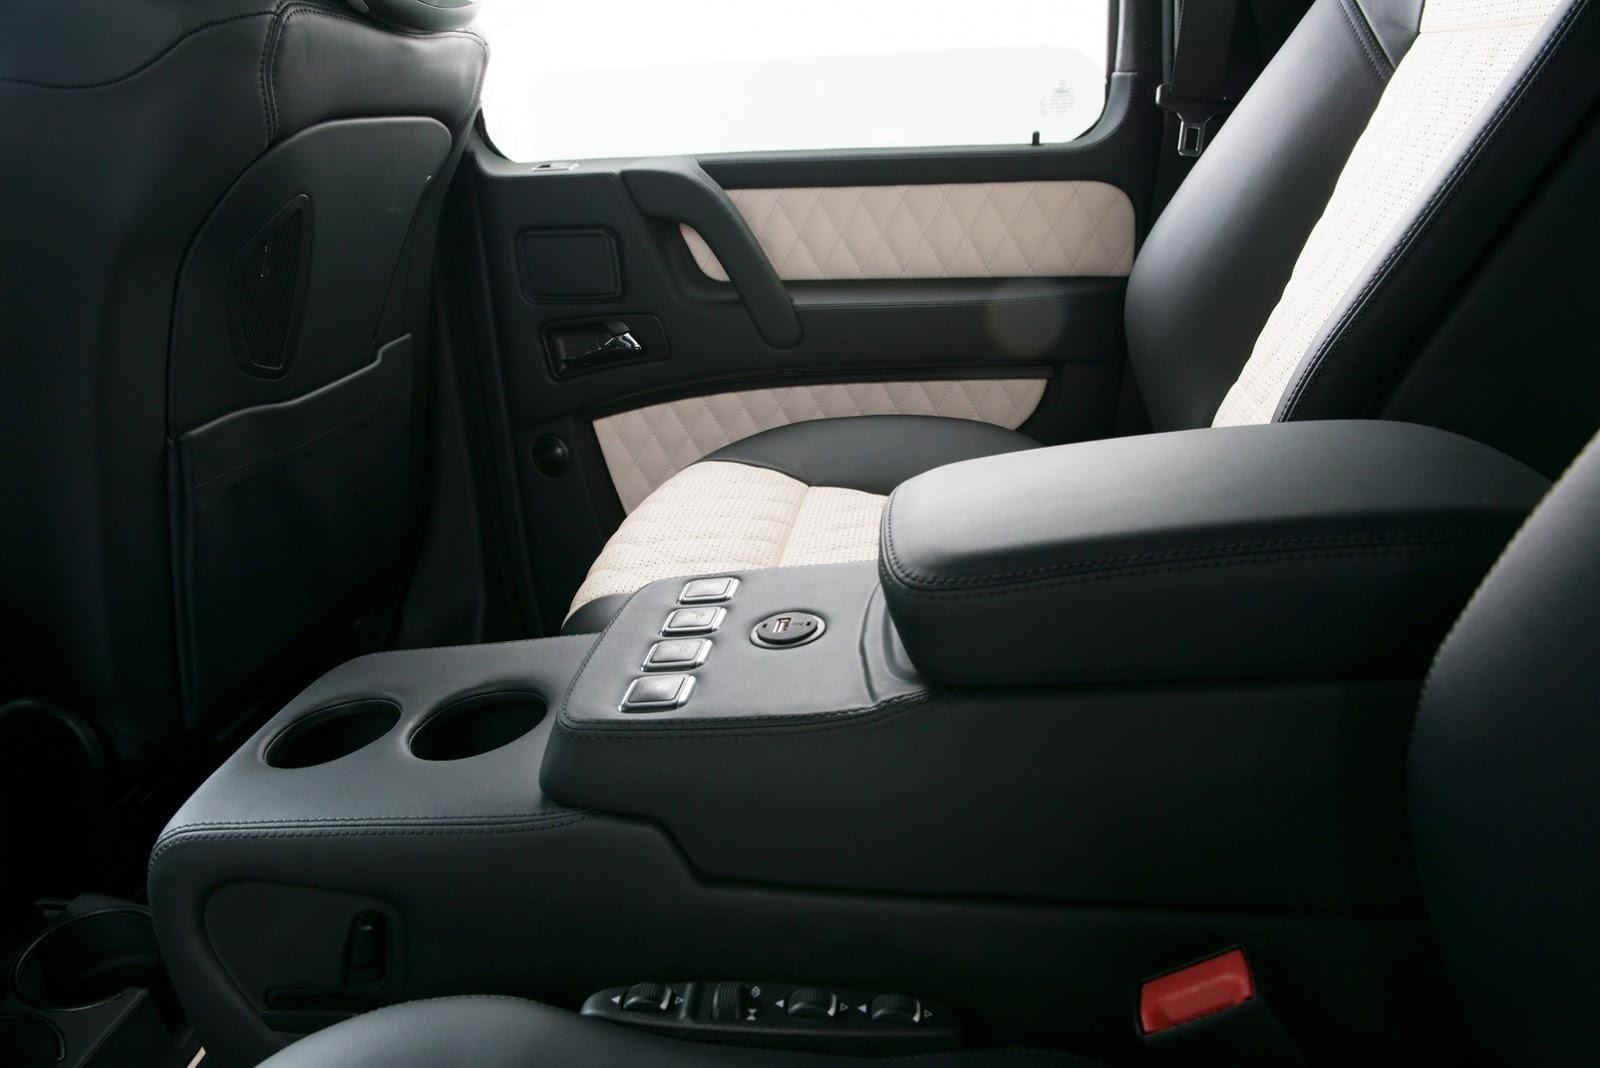 Mercedes G63 AMG por IMSA: 730 CV de pura potencia 2